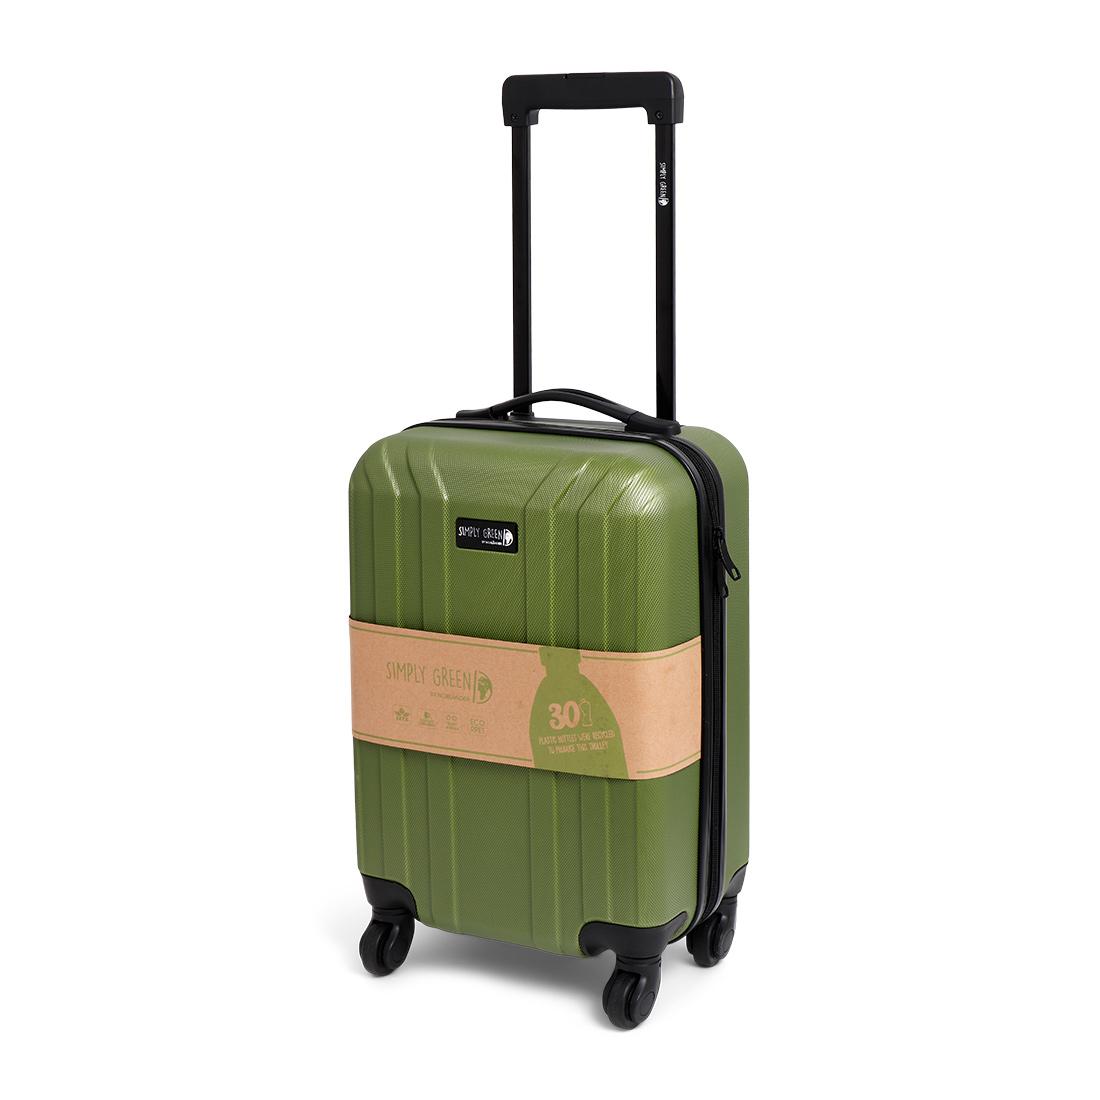 Duurzame handbagage koffer trolley tegen de plastic soep